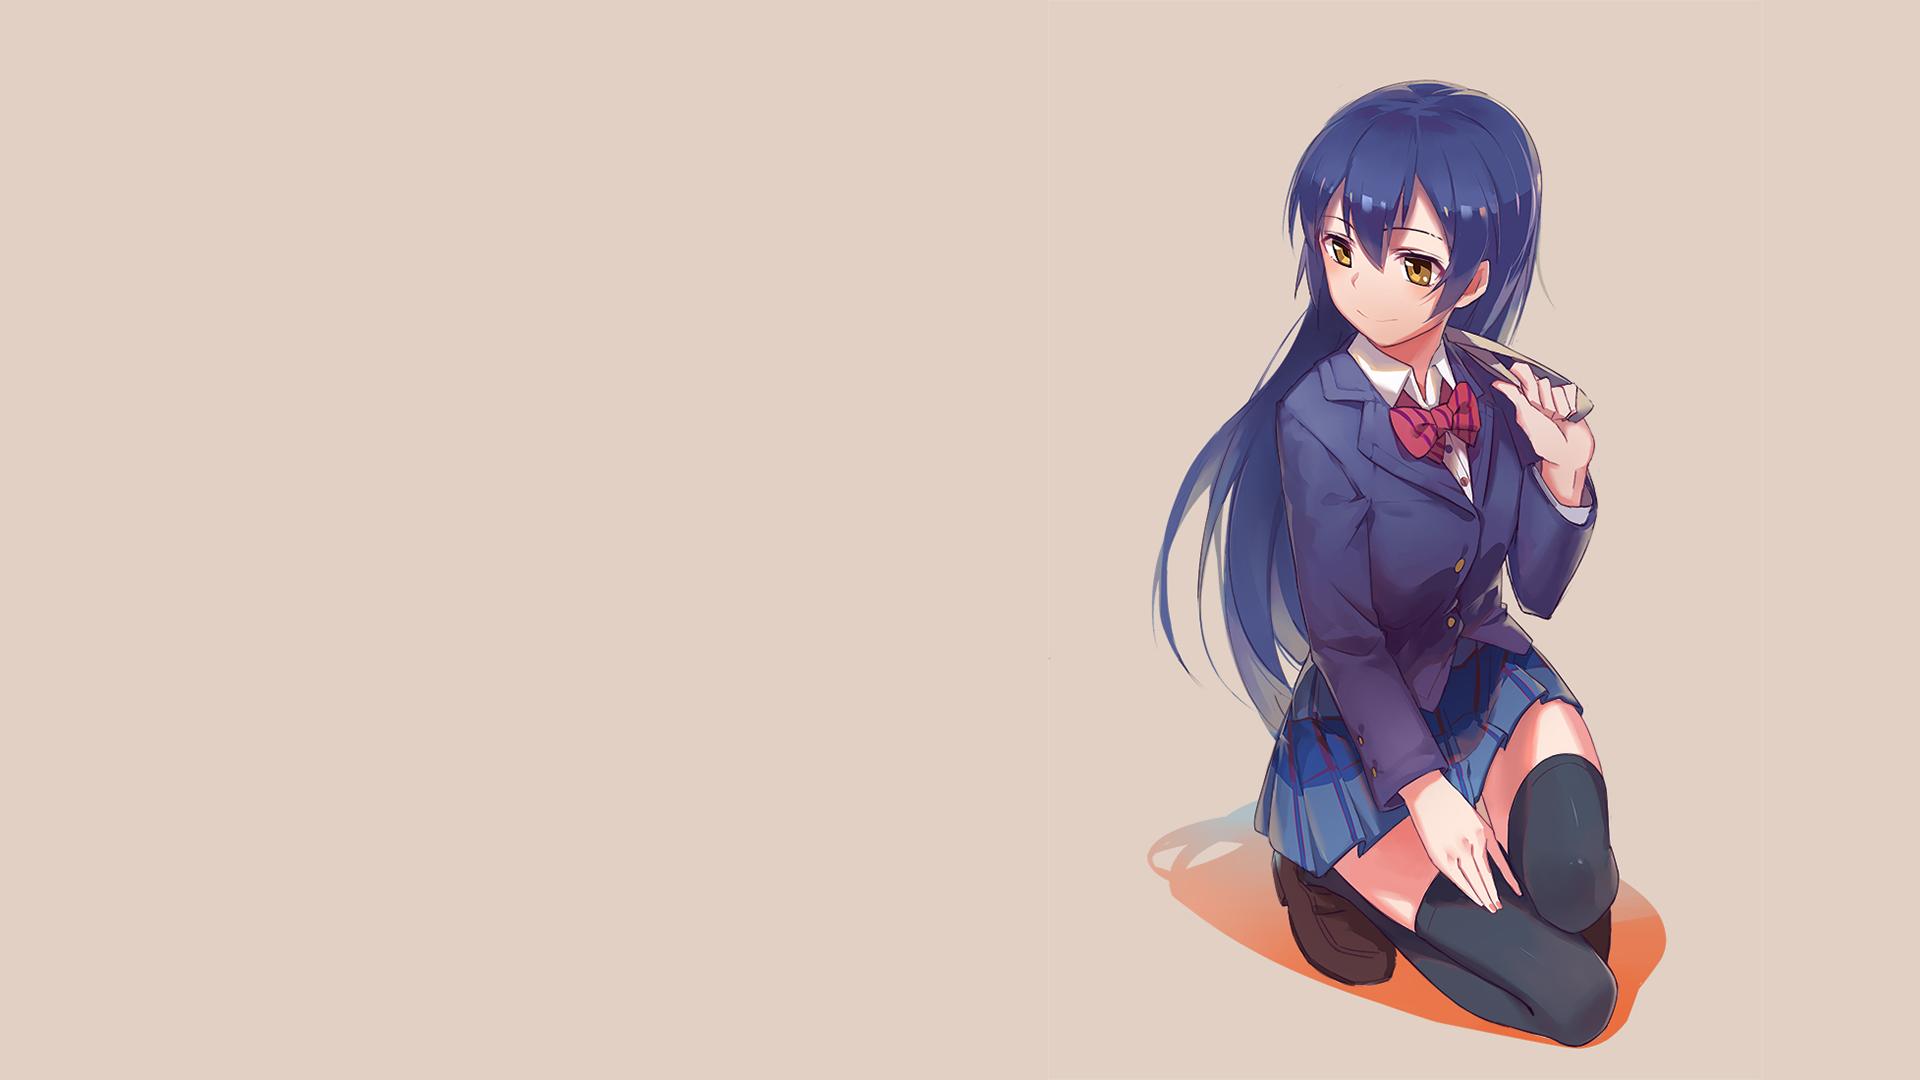 Illustration Simple Background Long Hair Anime Girls Yellow Eyes Blue Love Live Cartoon Thigh